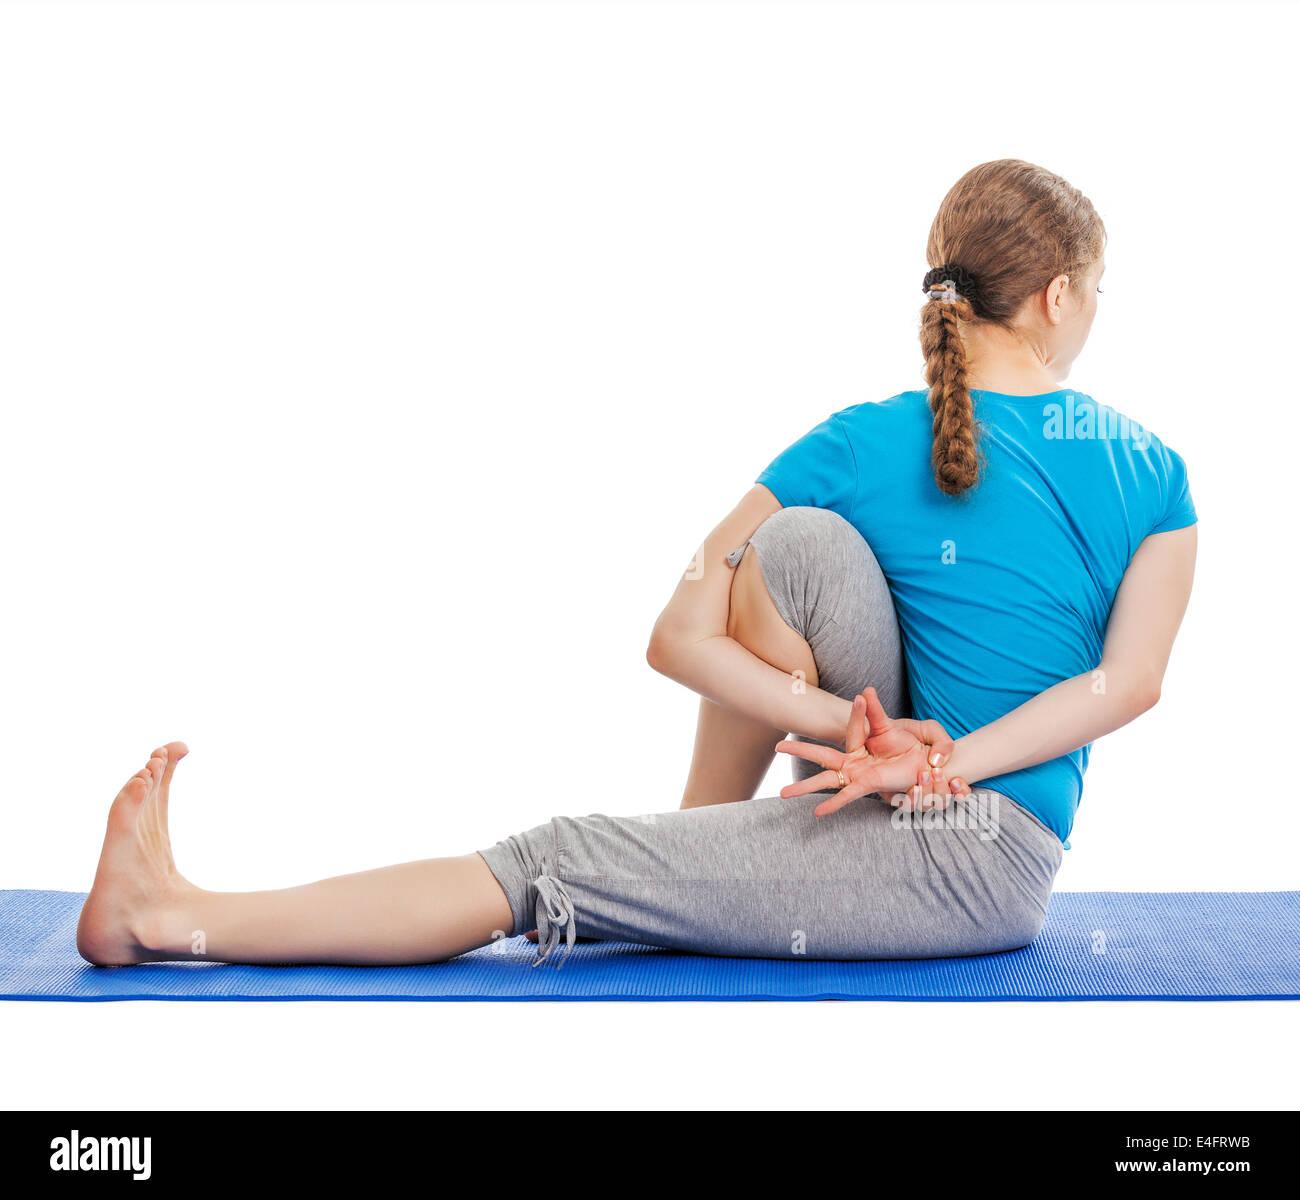 Yoga - young beautiful slender woman yoga instructor doing Forward Bends Sage Twist C pose (Marichyasana C) asana - Stock Image